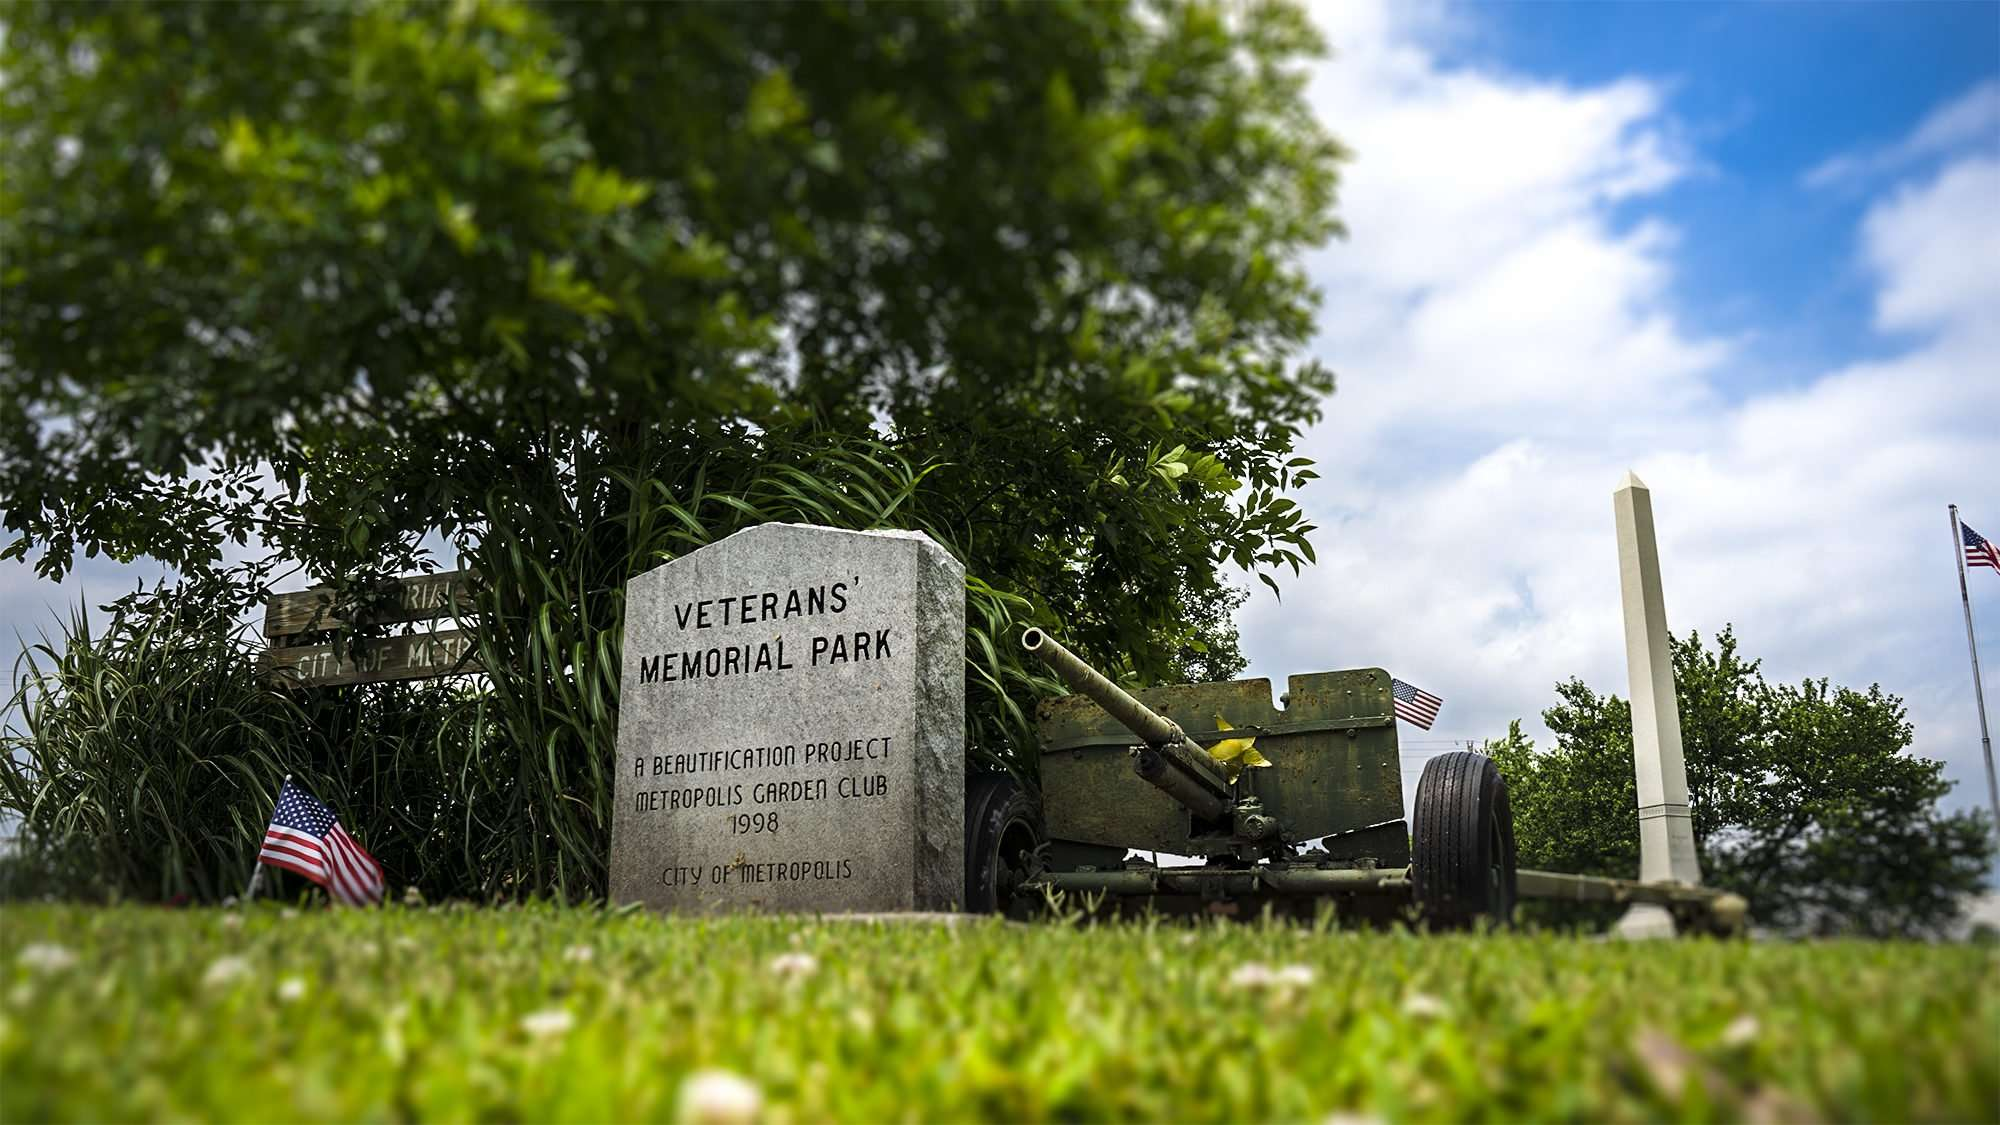 June 17, 2017 - Veterans Memorial Park, Metropolis, IL/photonews247.com